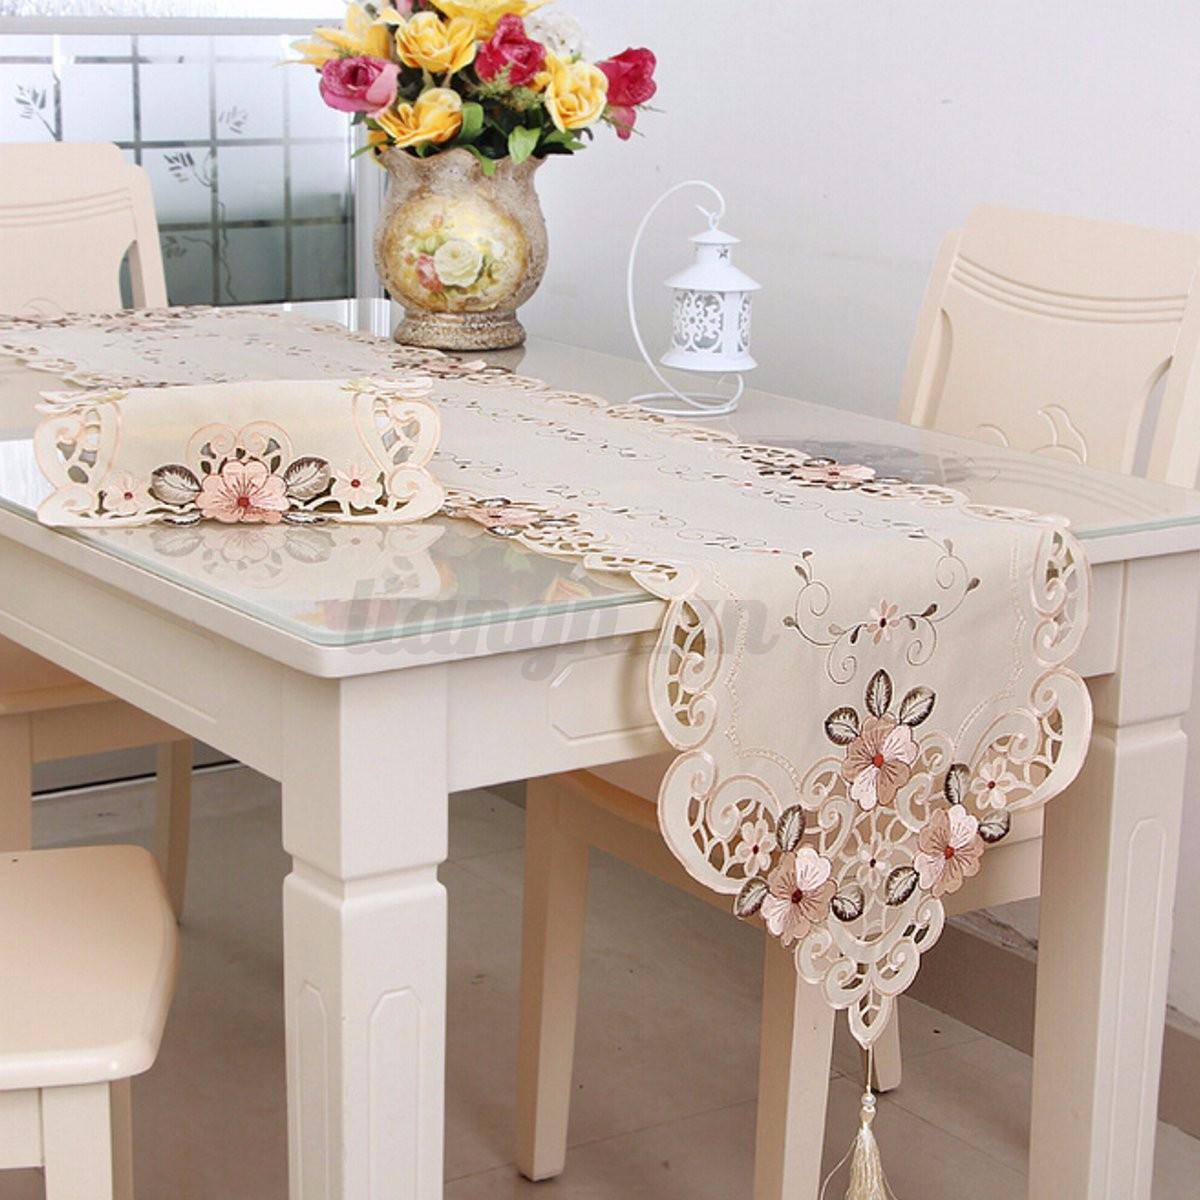 chemin de table d coration nappe napperon fleurs broderie f te mariage 7 styles ebay. Black Bedroom Furniture Sets. Home Design Ideas